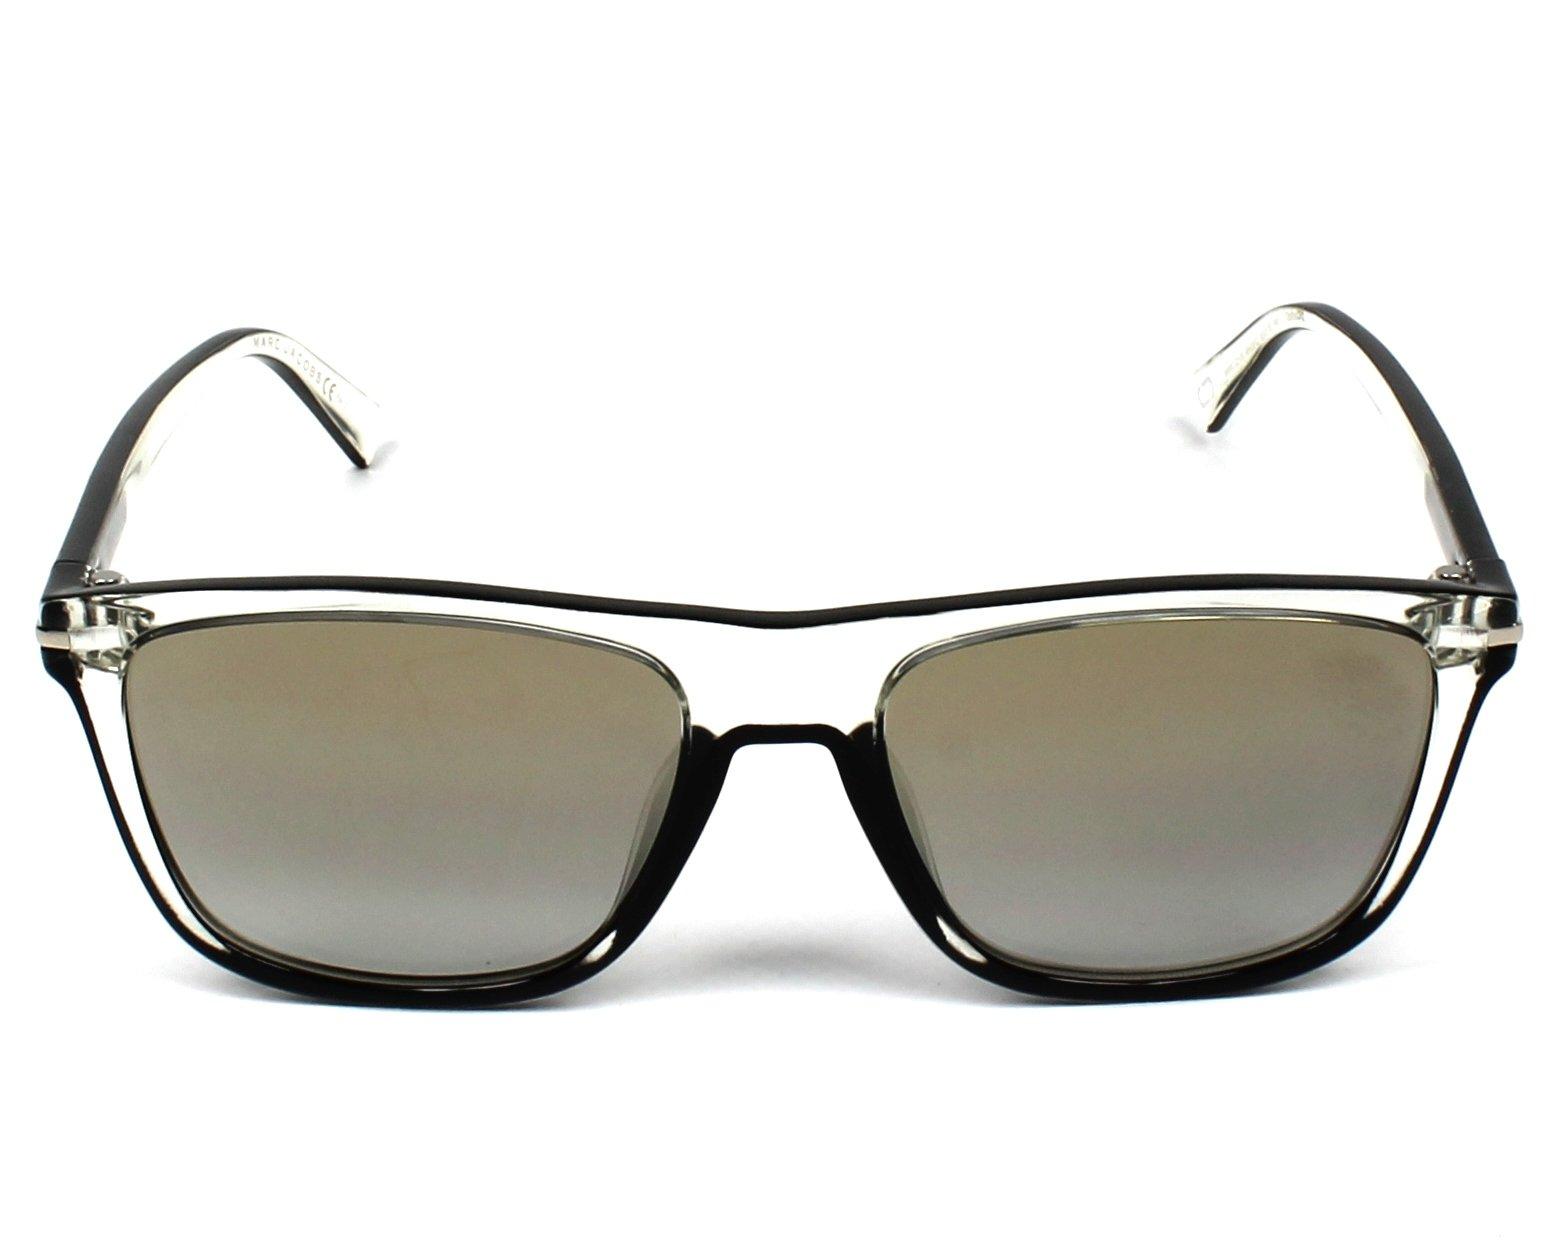 Sunglasses Marc Jacobs MARC-221-S MNG FQ 55-18 Crystal Black 2c17d158d25e